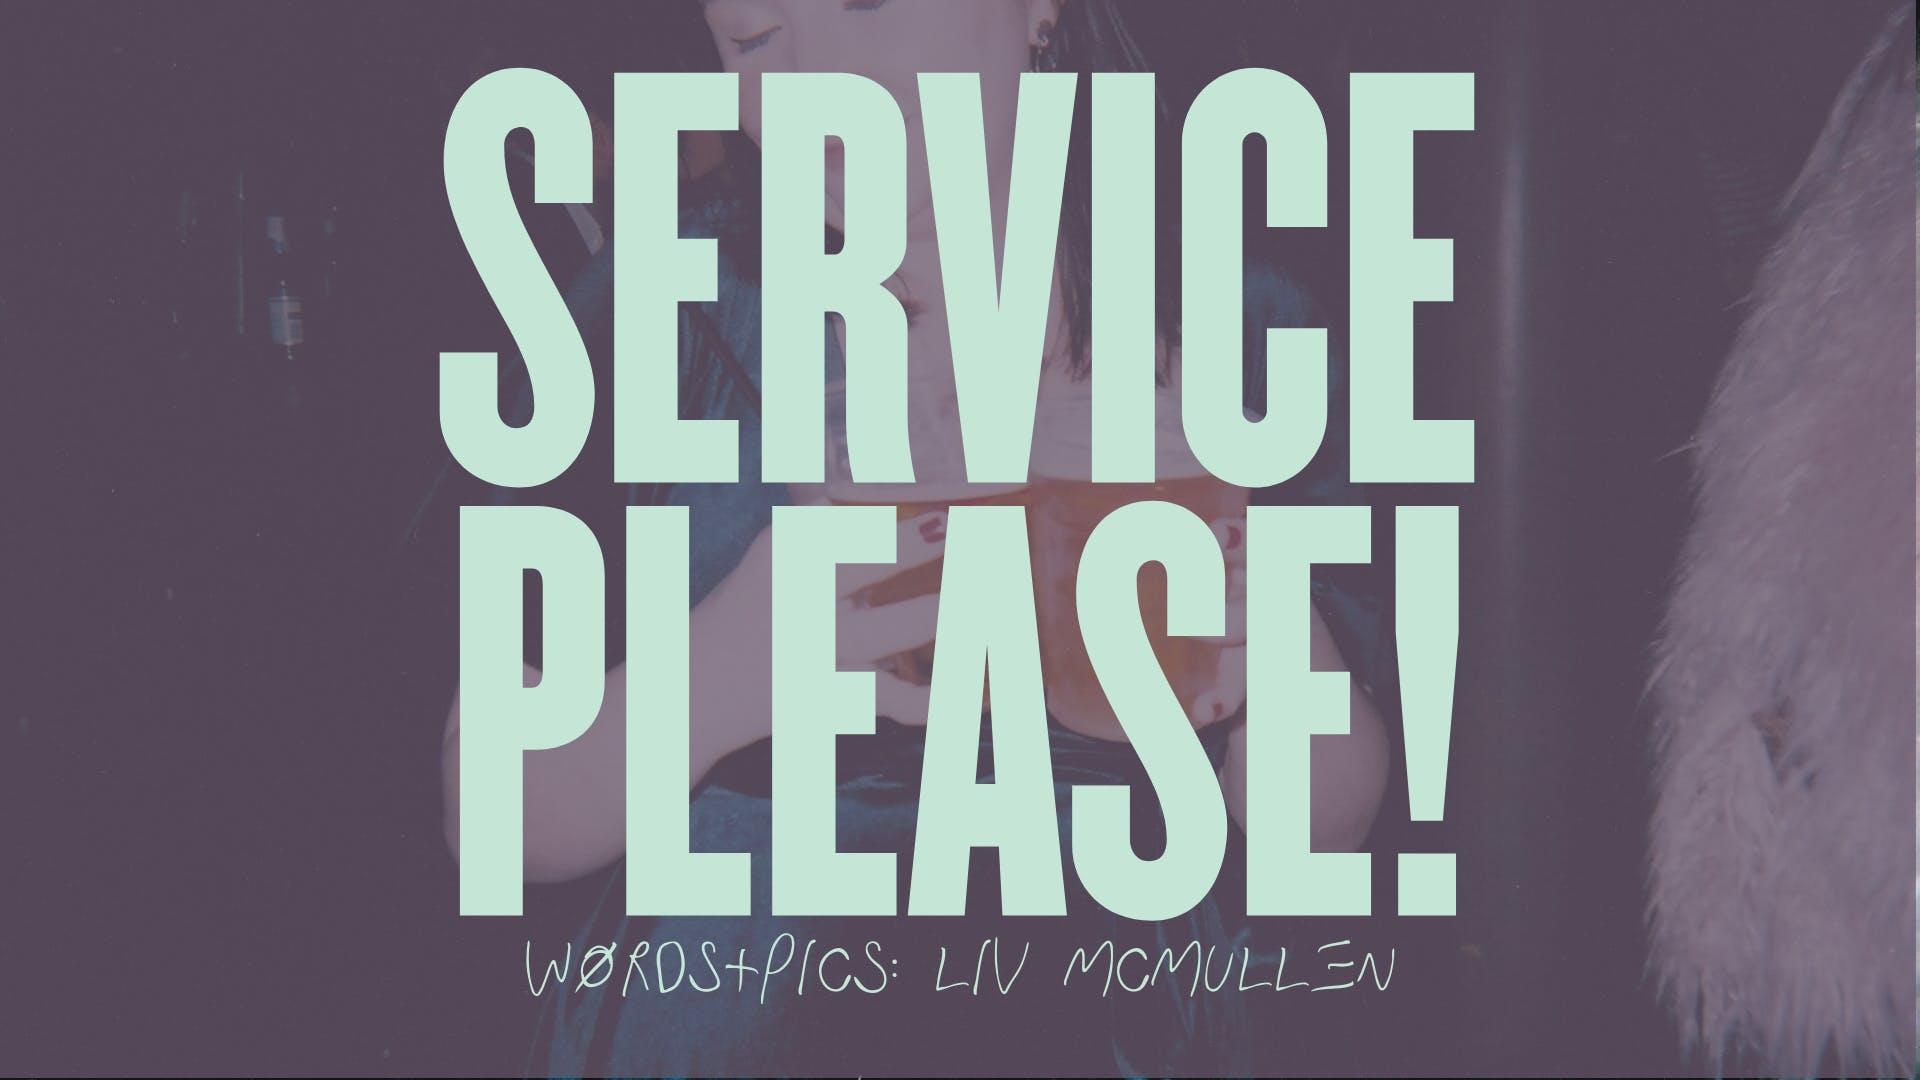 SERVICE PLEASE!